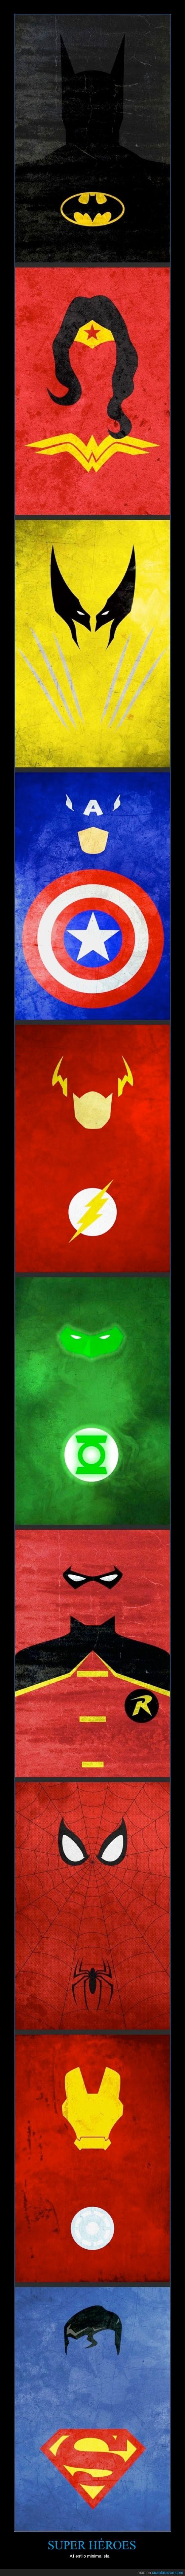 batman,capitn america,flash,hombre araña,iron man,linterna verde,mujer maravila,robin,superman,xmen